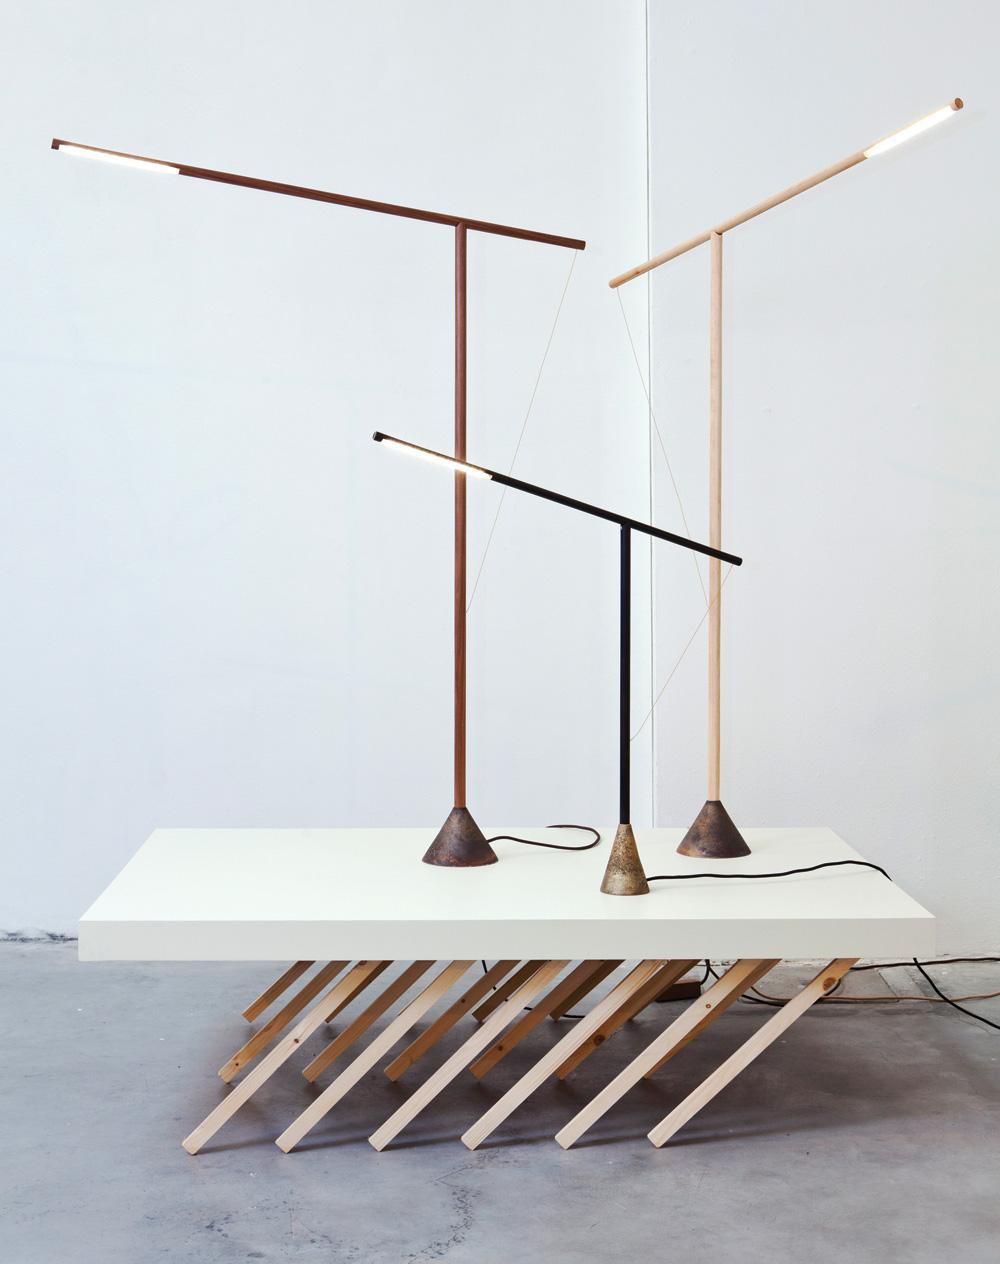 http://mocoloco.com/fresh2/upload/2012/05/balance_lamp_v20_by_mieke_meijer/balance_lamp_v2_mieke_meijer_2b.jpg